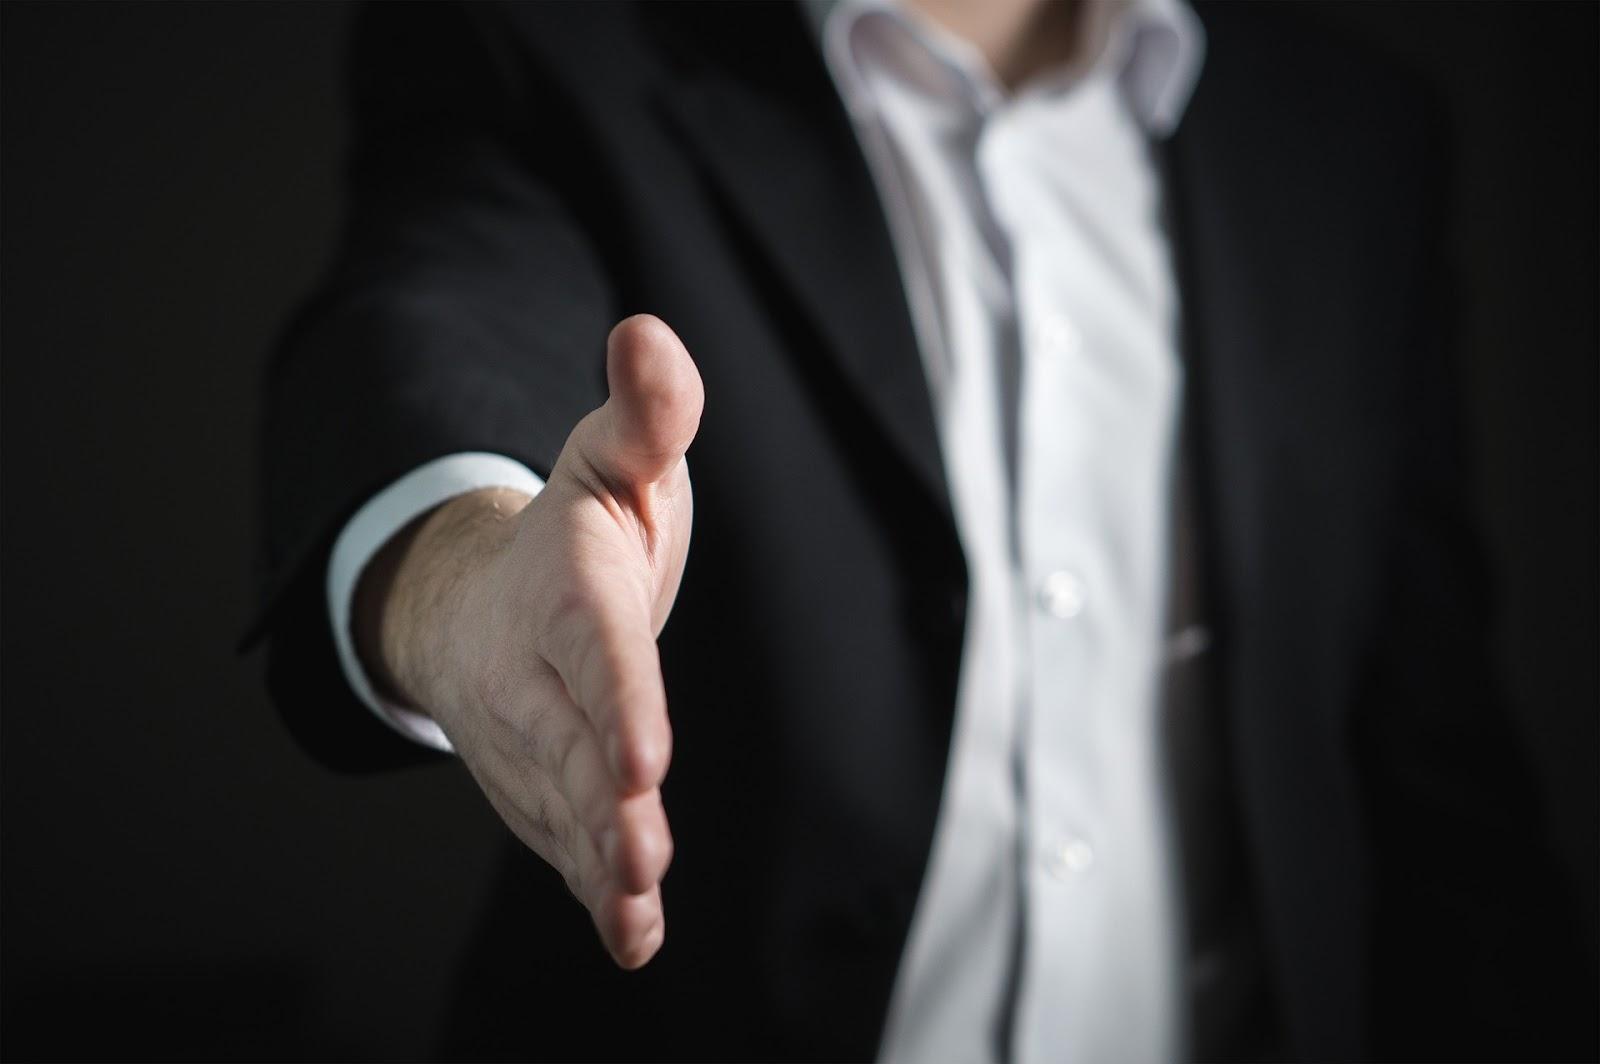 man reaching for handshake